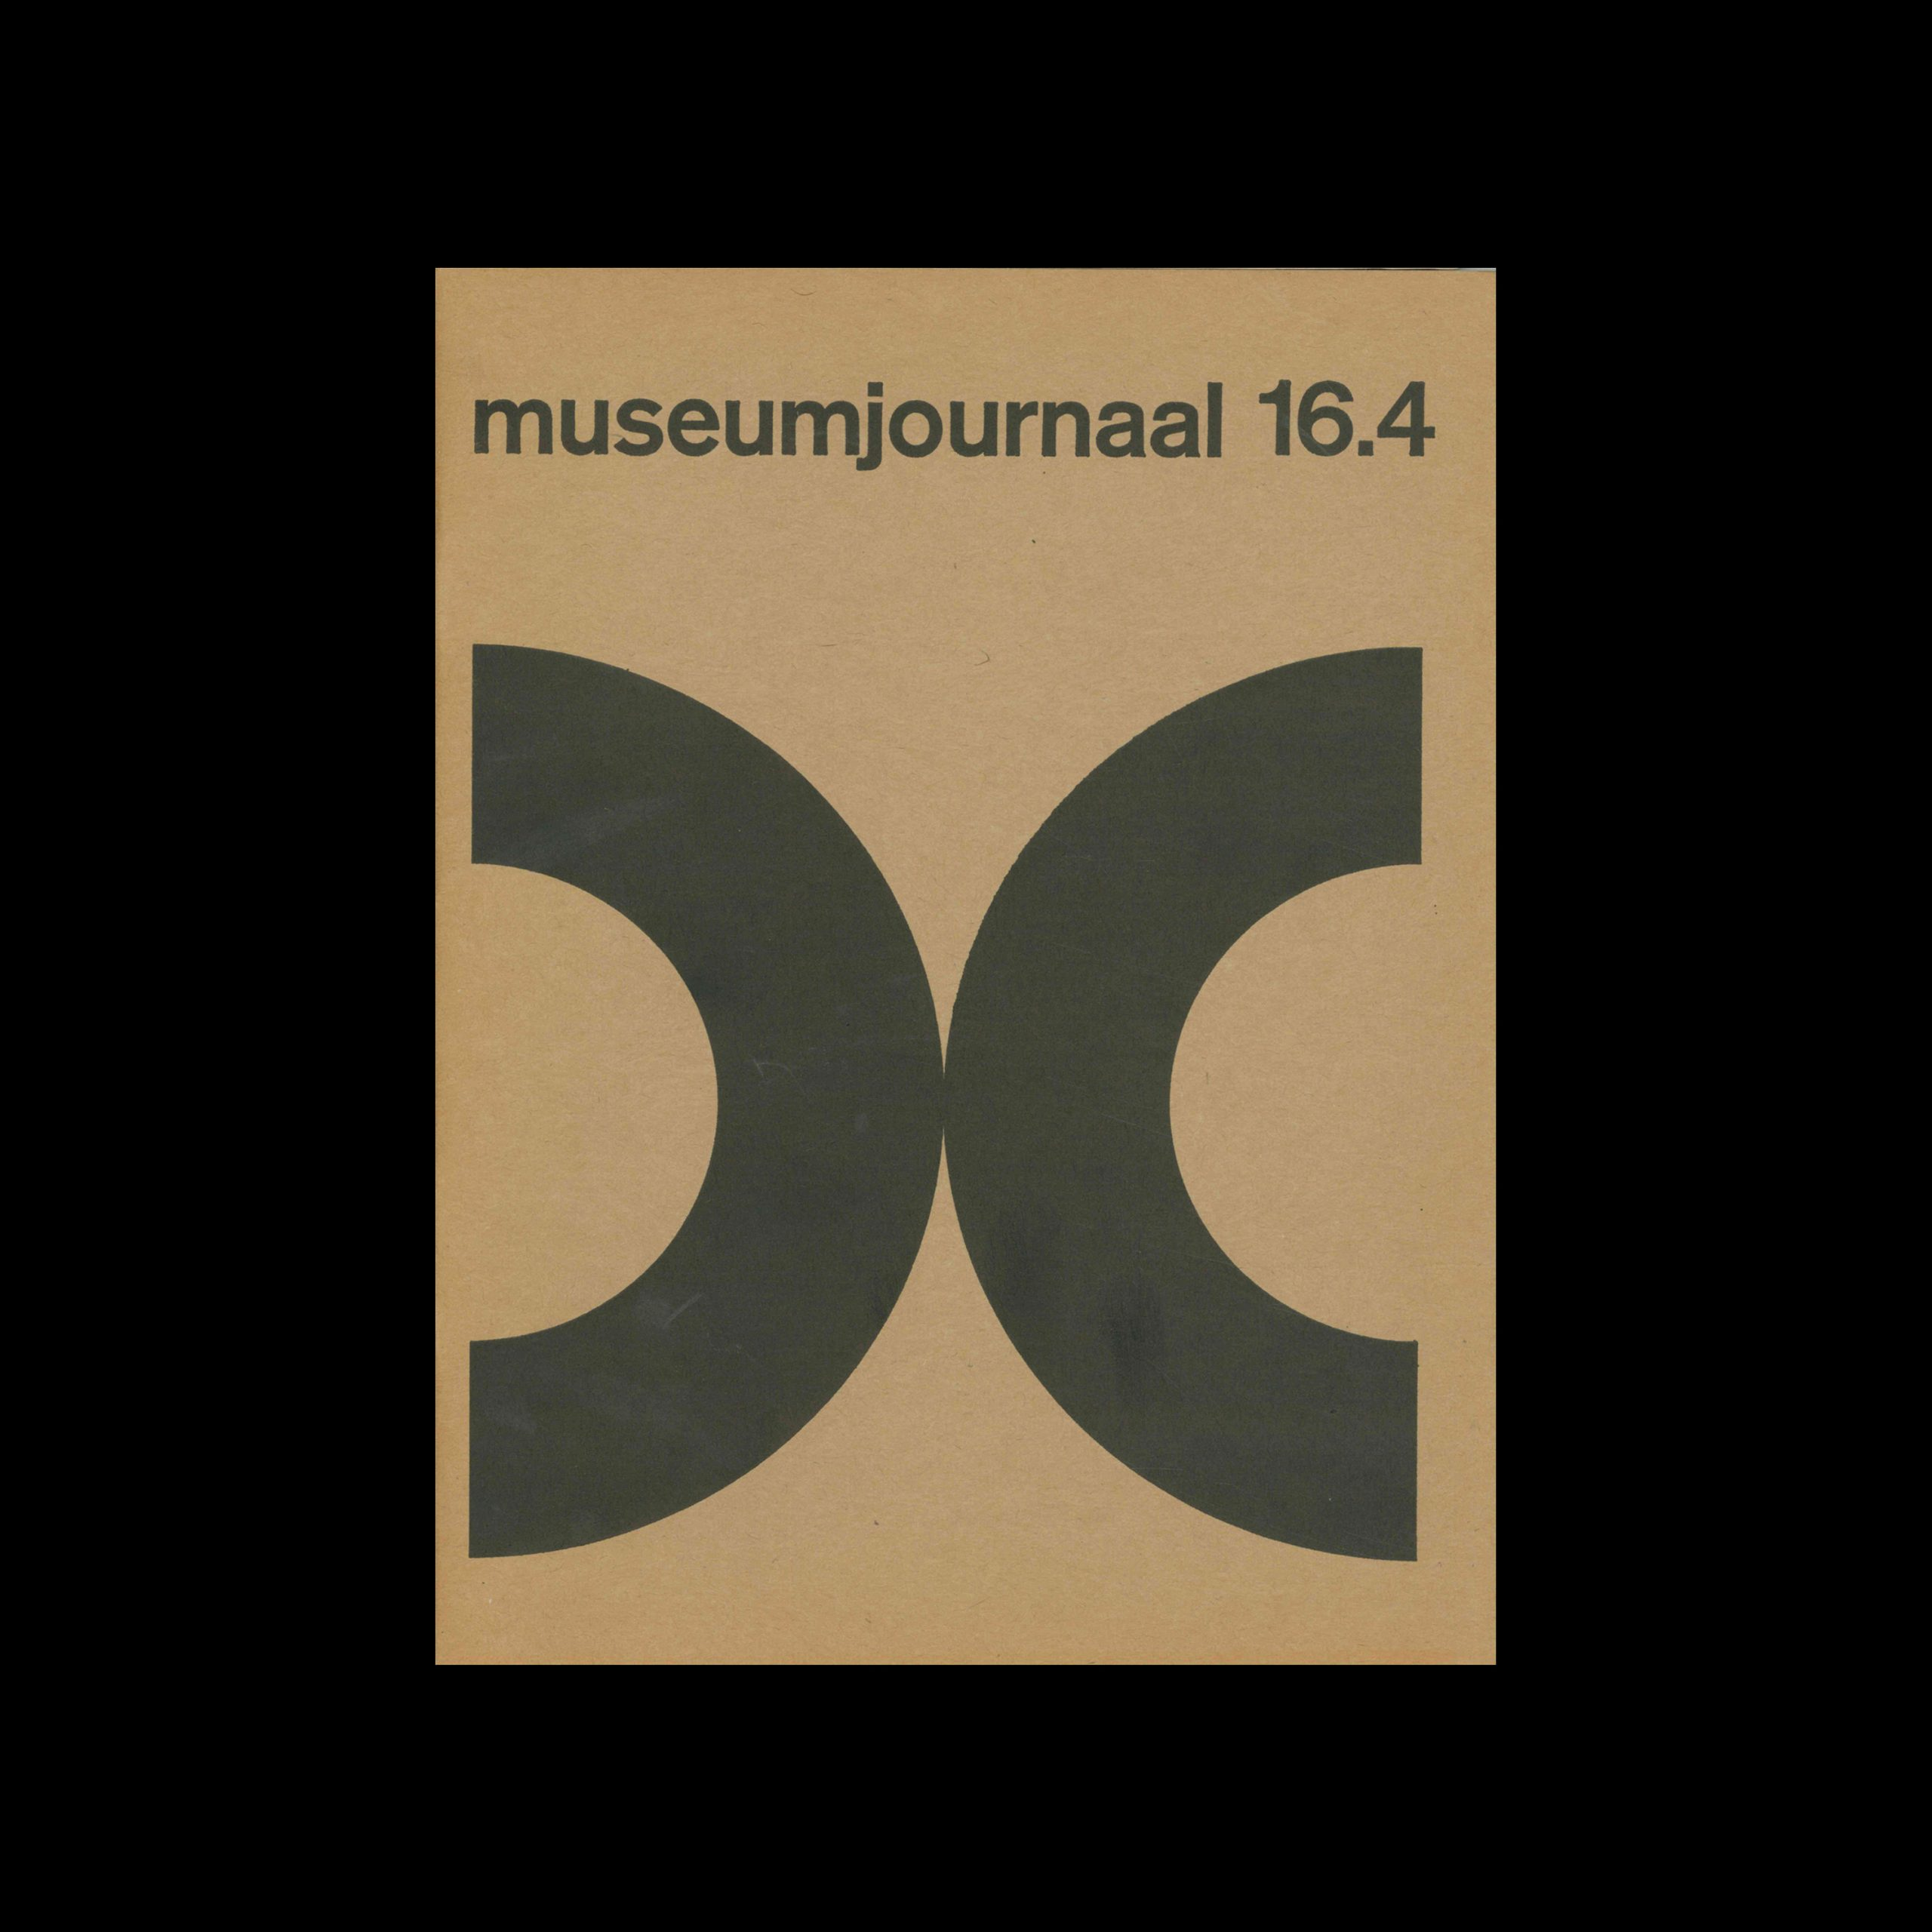 Museumjournaal, Serie 16 no4, 1971. Designed by Jurriaan Schrofer.